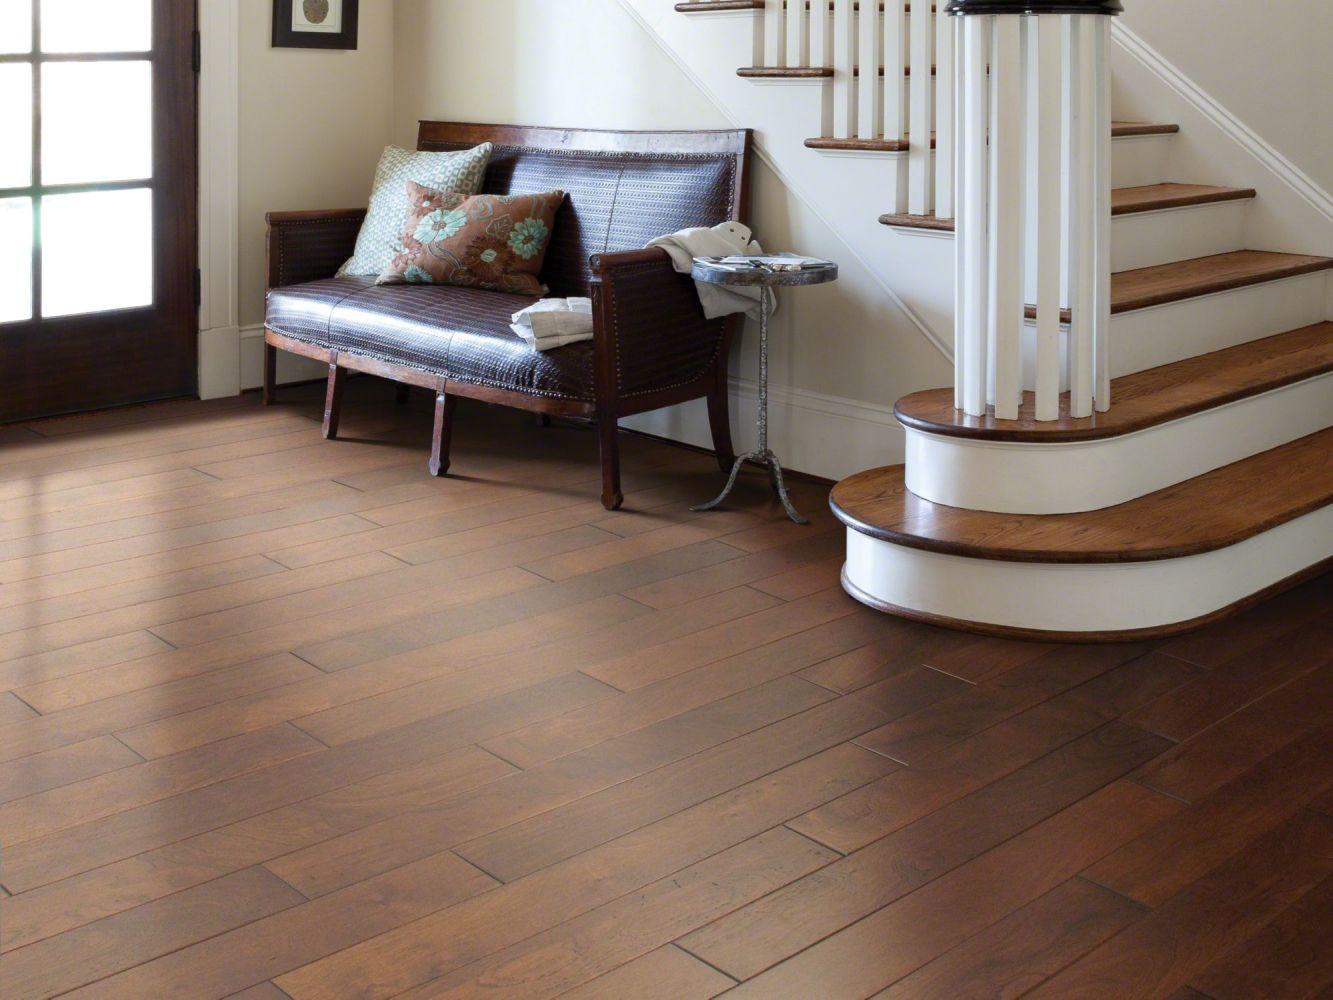 Shaw Floors Home Fn Gold Hardwood Palazzo Lavaredo 00328_HW517